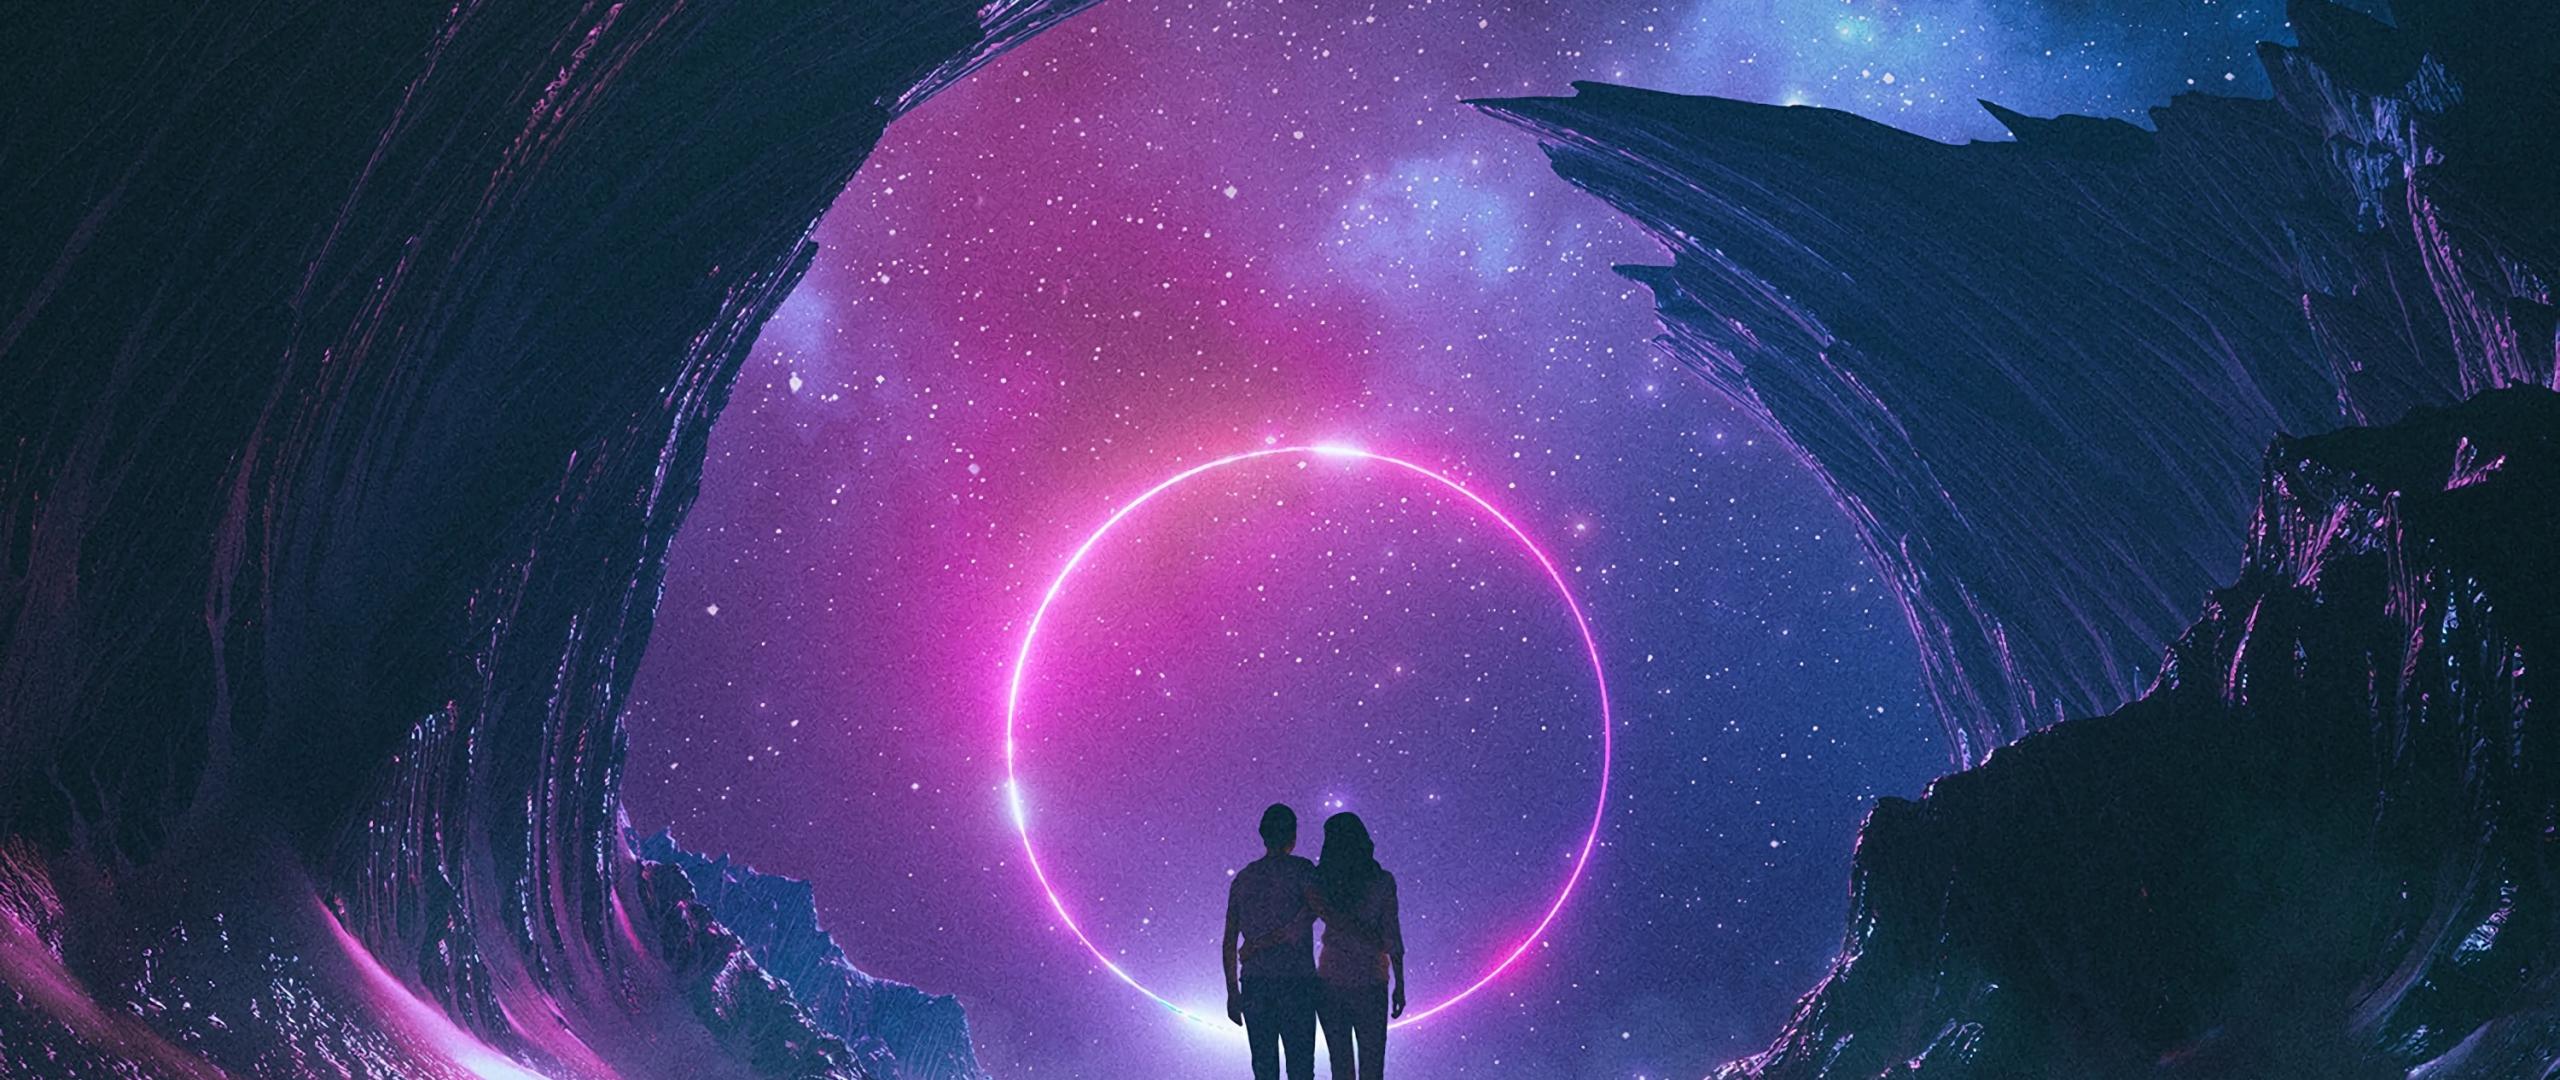 Download 2560x1080 wallpaper couple digital art fantasy - Fantasy wallpaper digital art ...